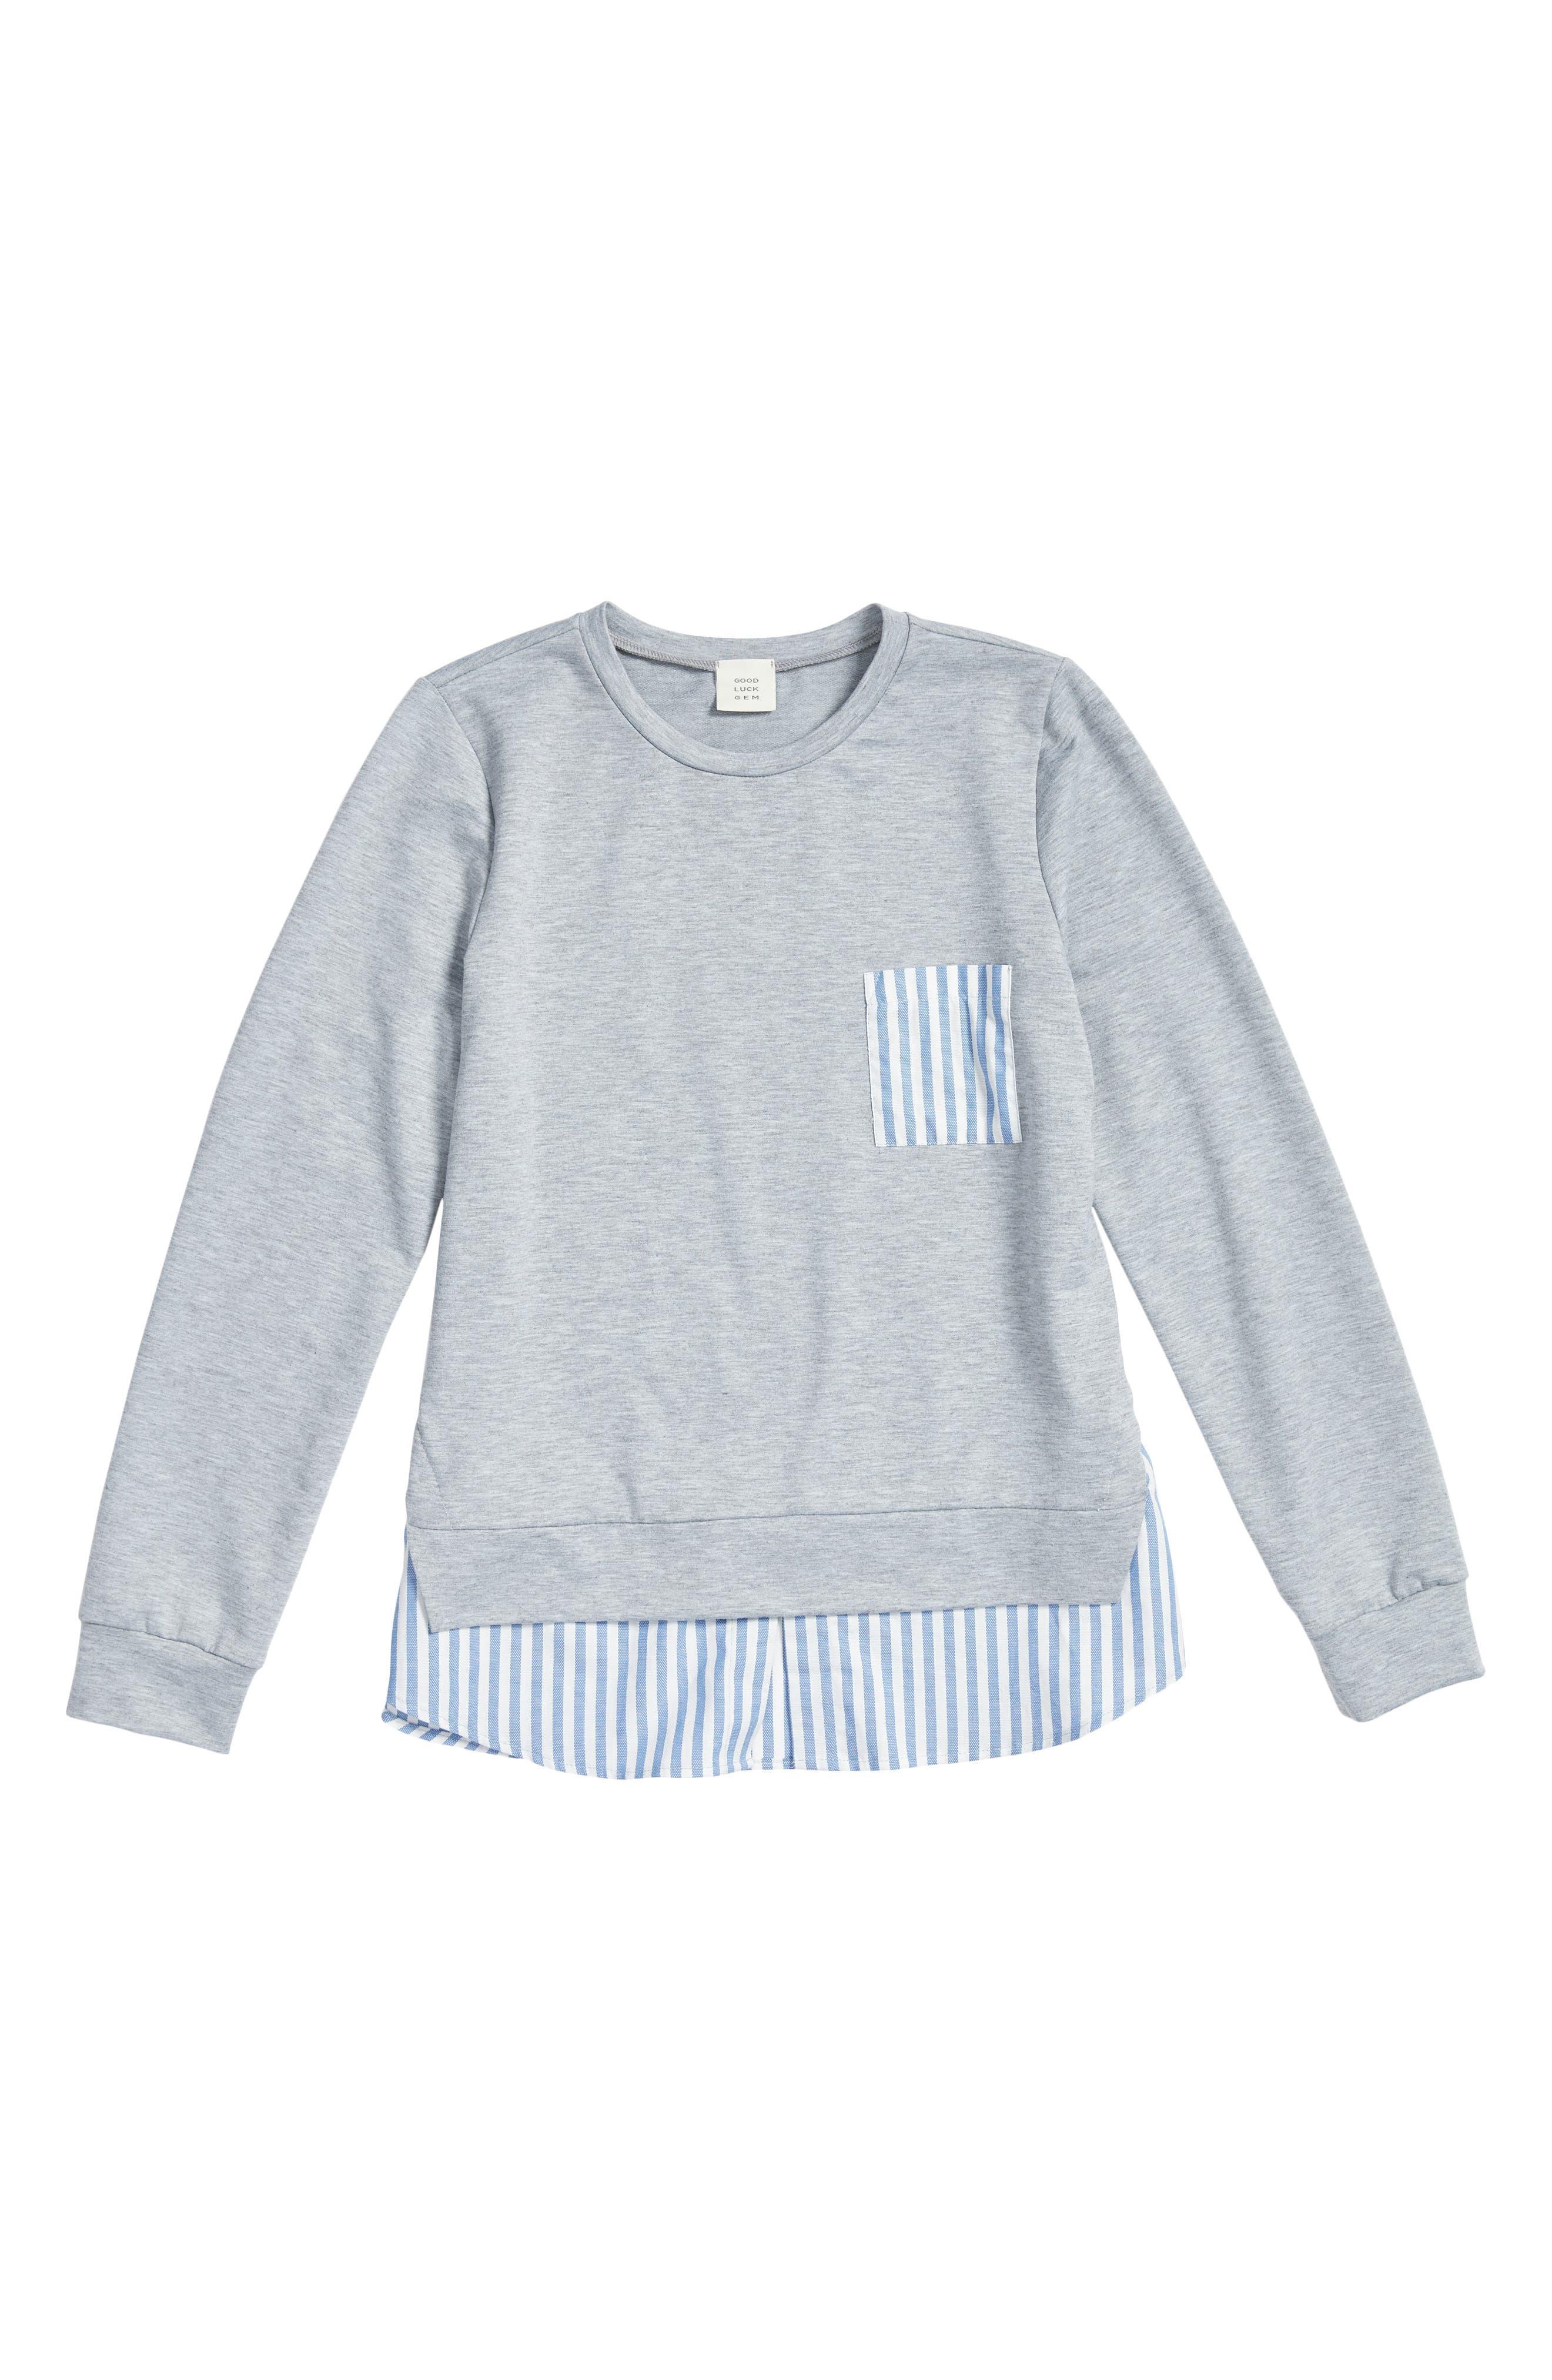 Main Image - Good Luck Gem Mixed Media Sweatshirt (Big Girls)